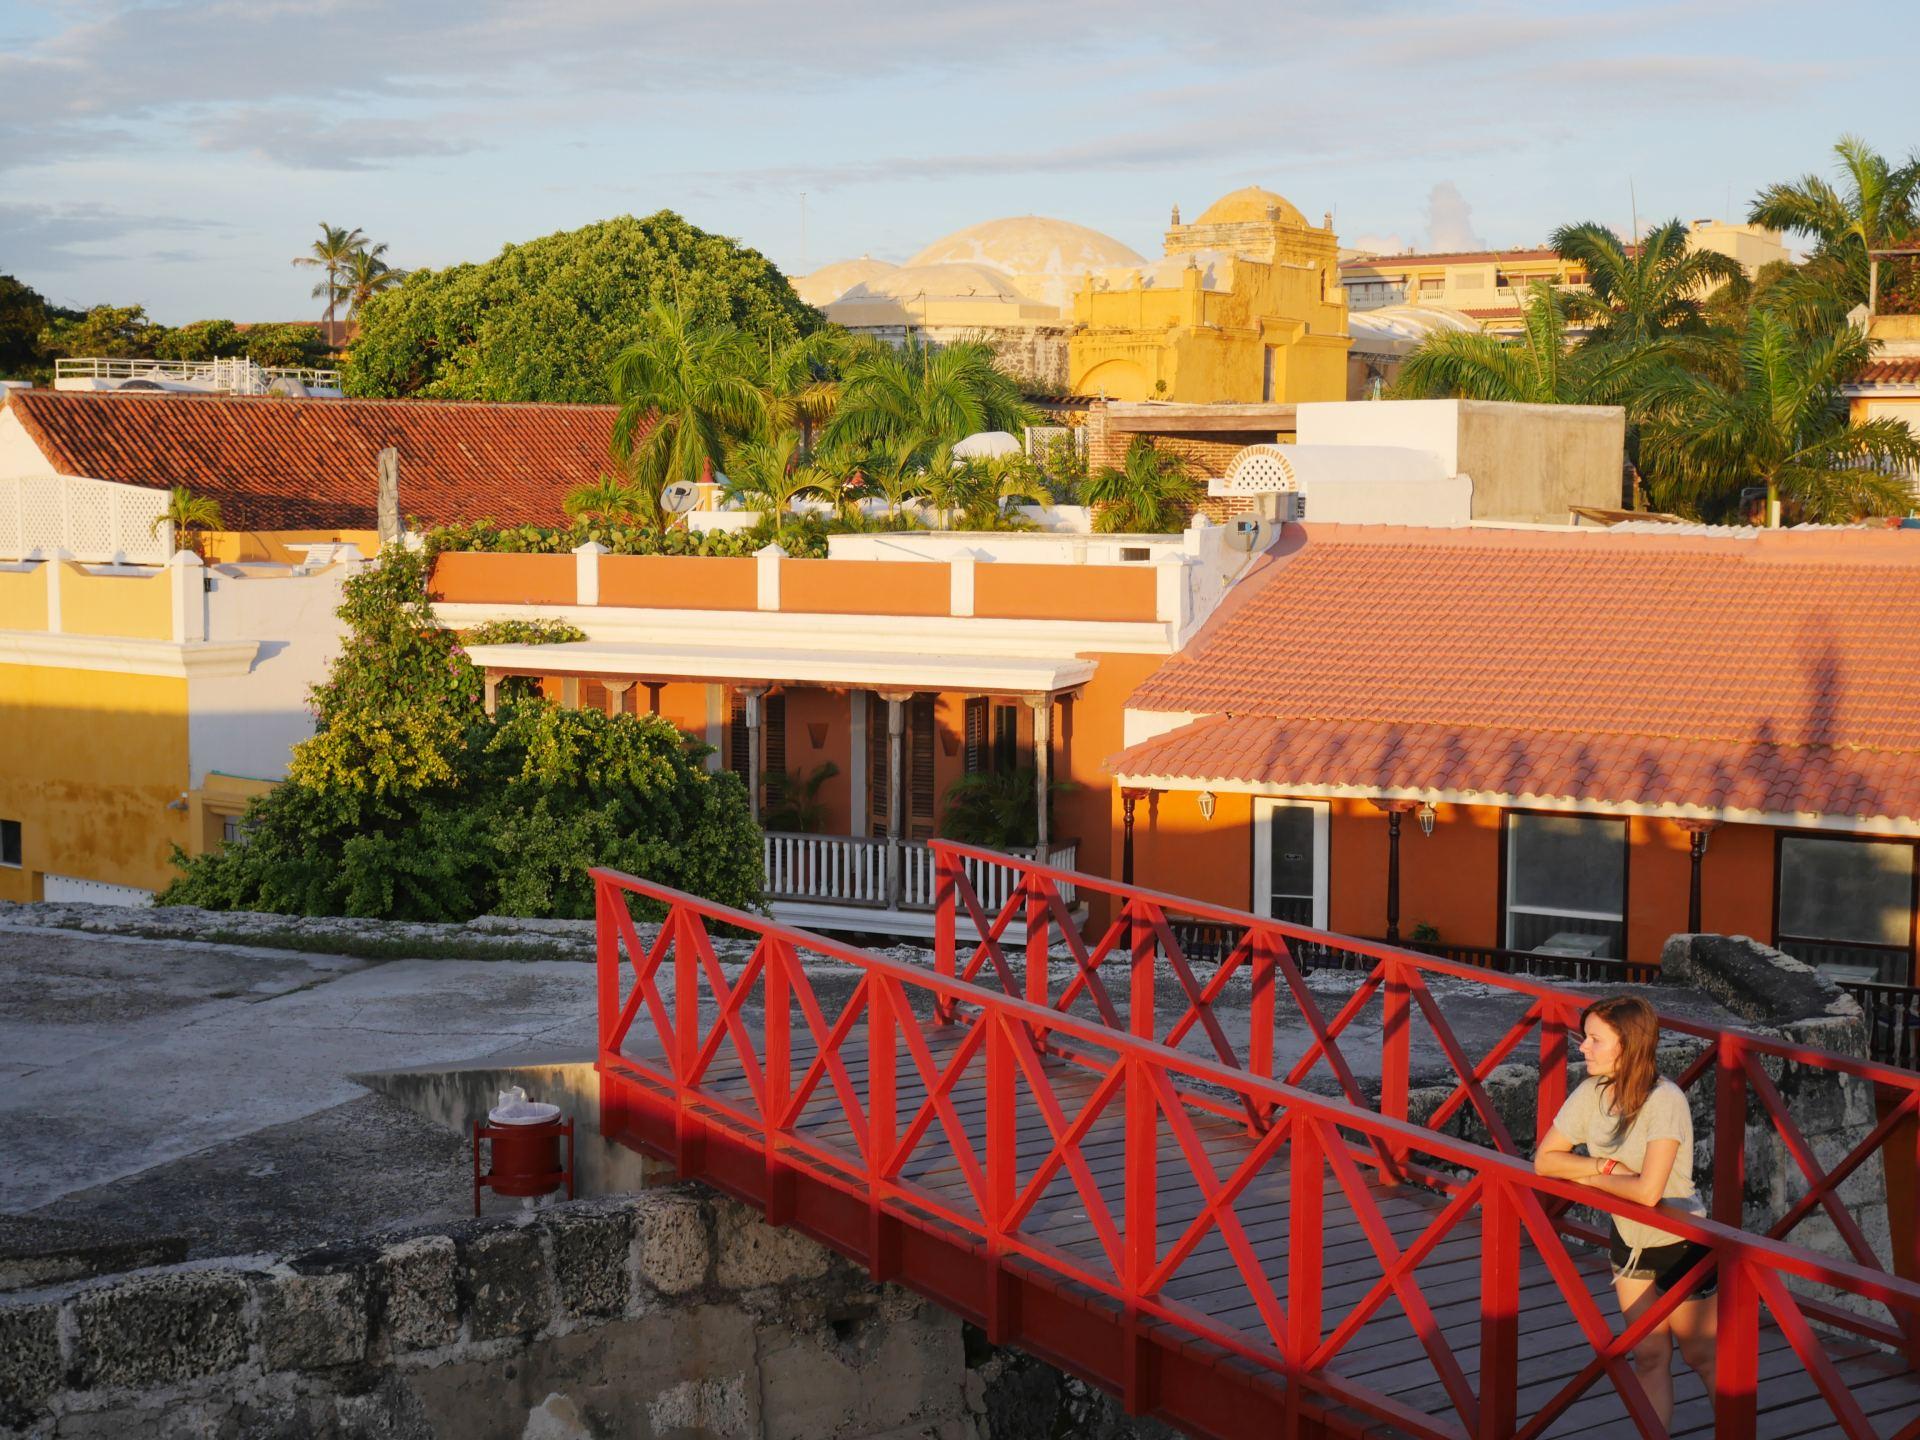 Cartagena Travel